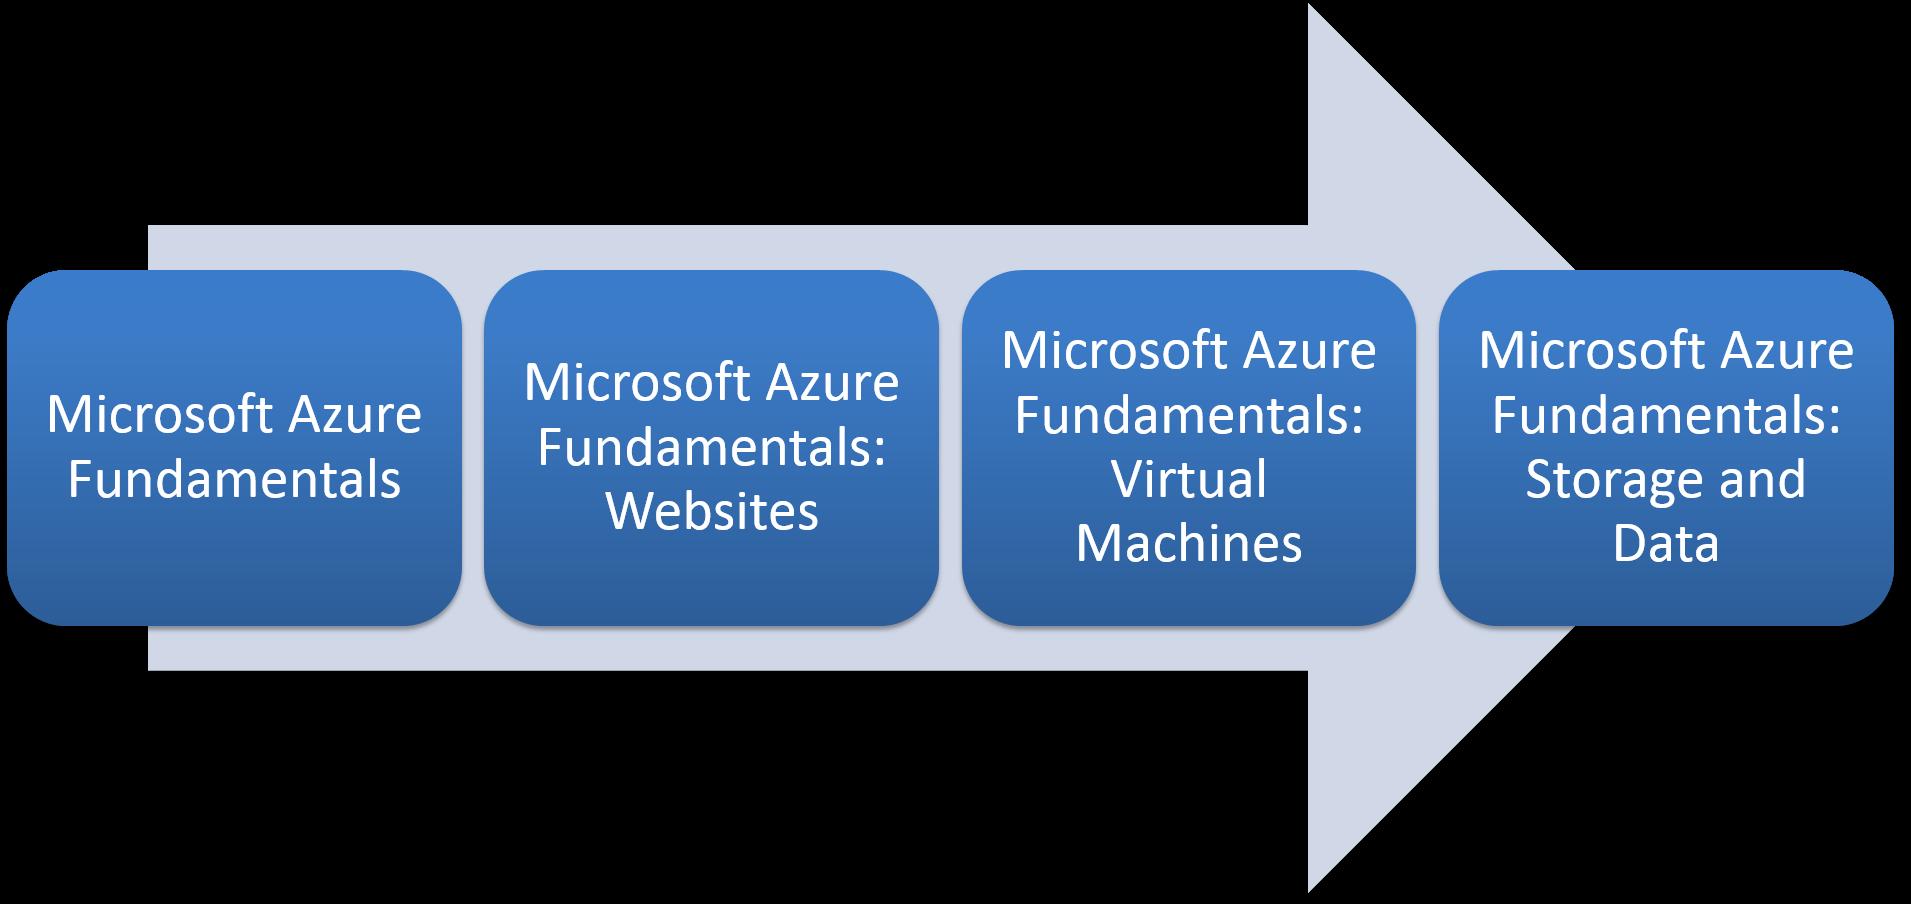 Learning Paths Microsoft Azure 2470872 - bunkyo info